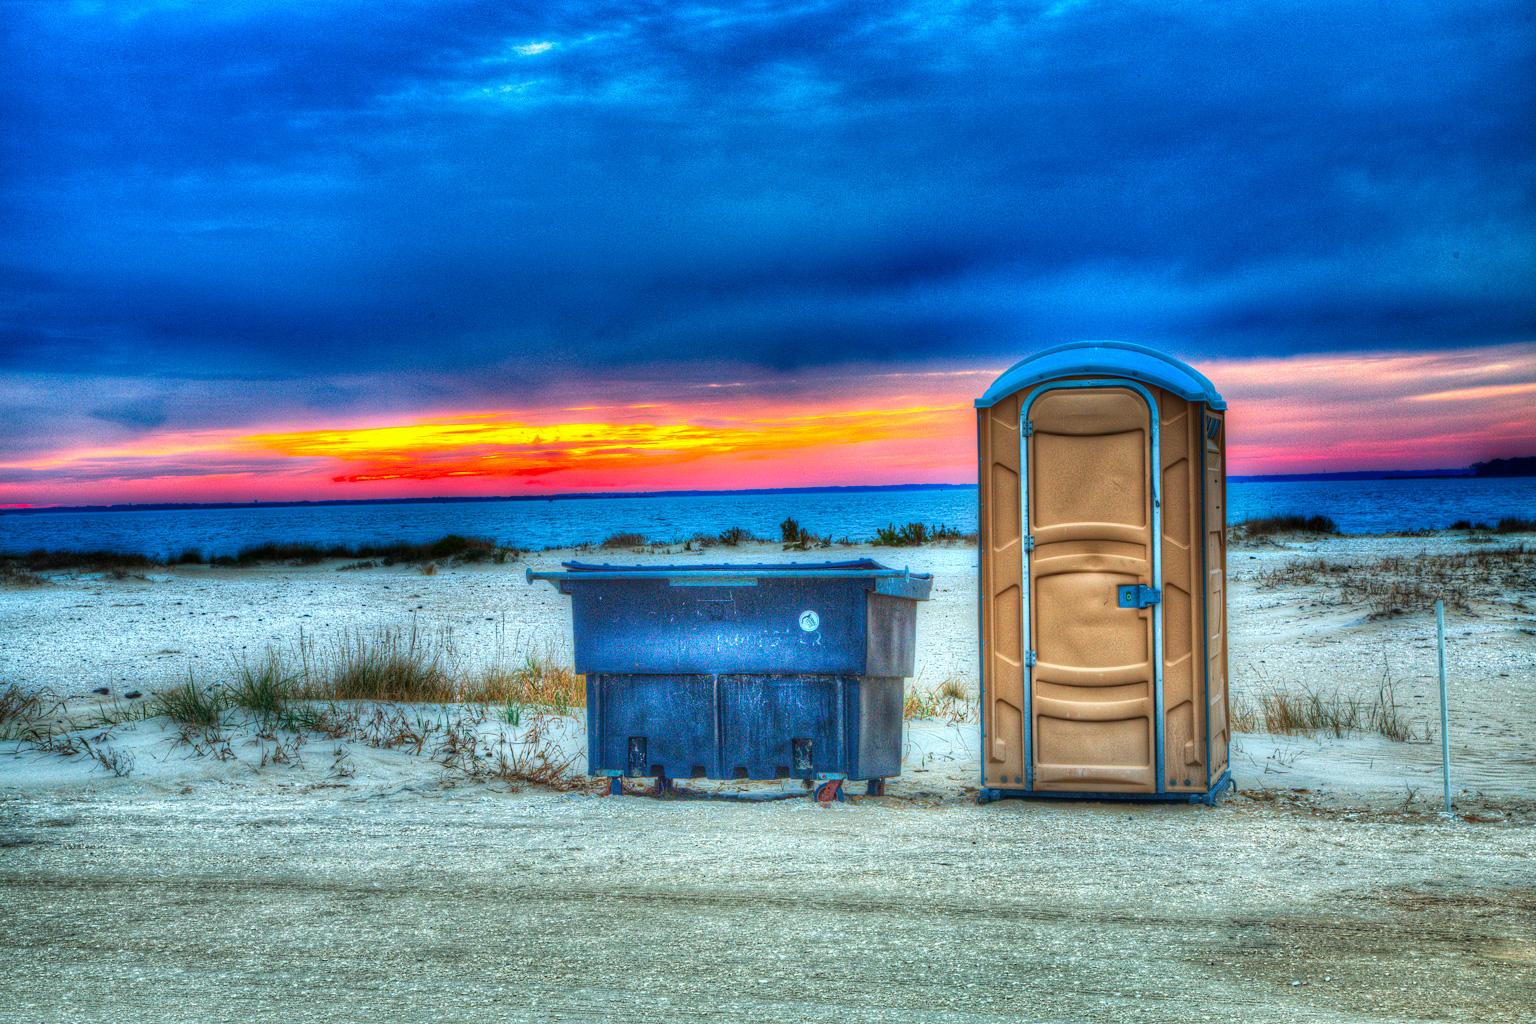 Chincoteague-Sunset_57A3976_7_8